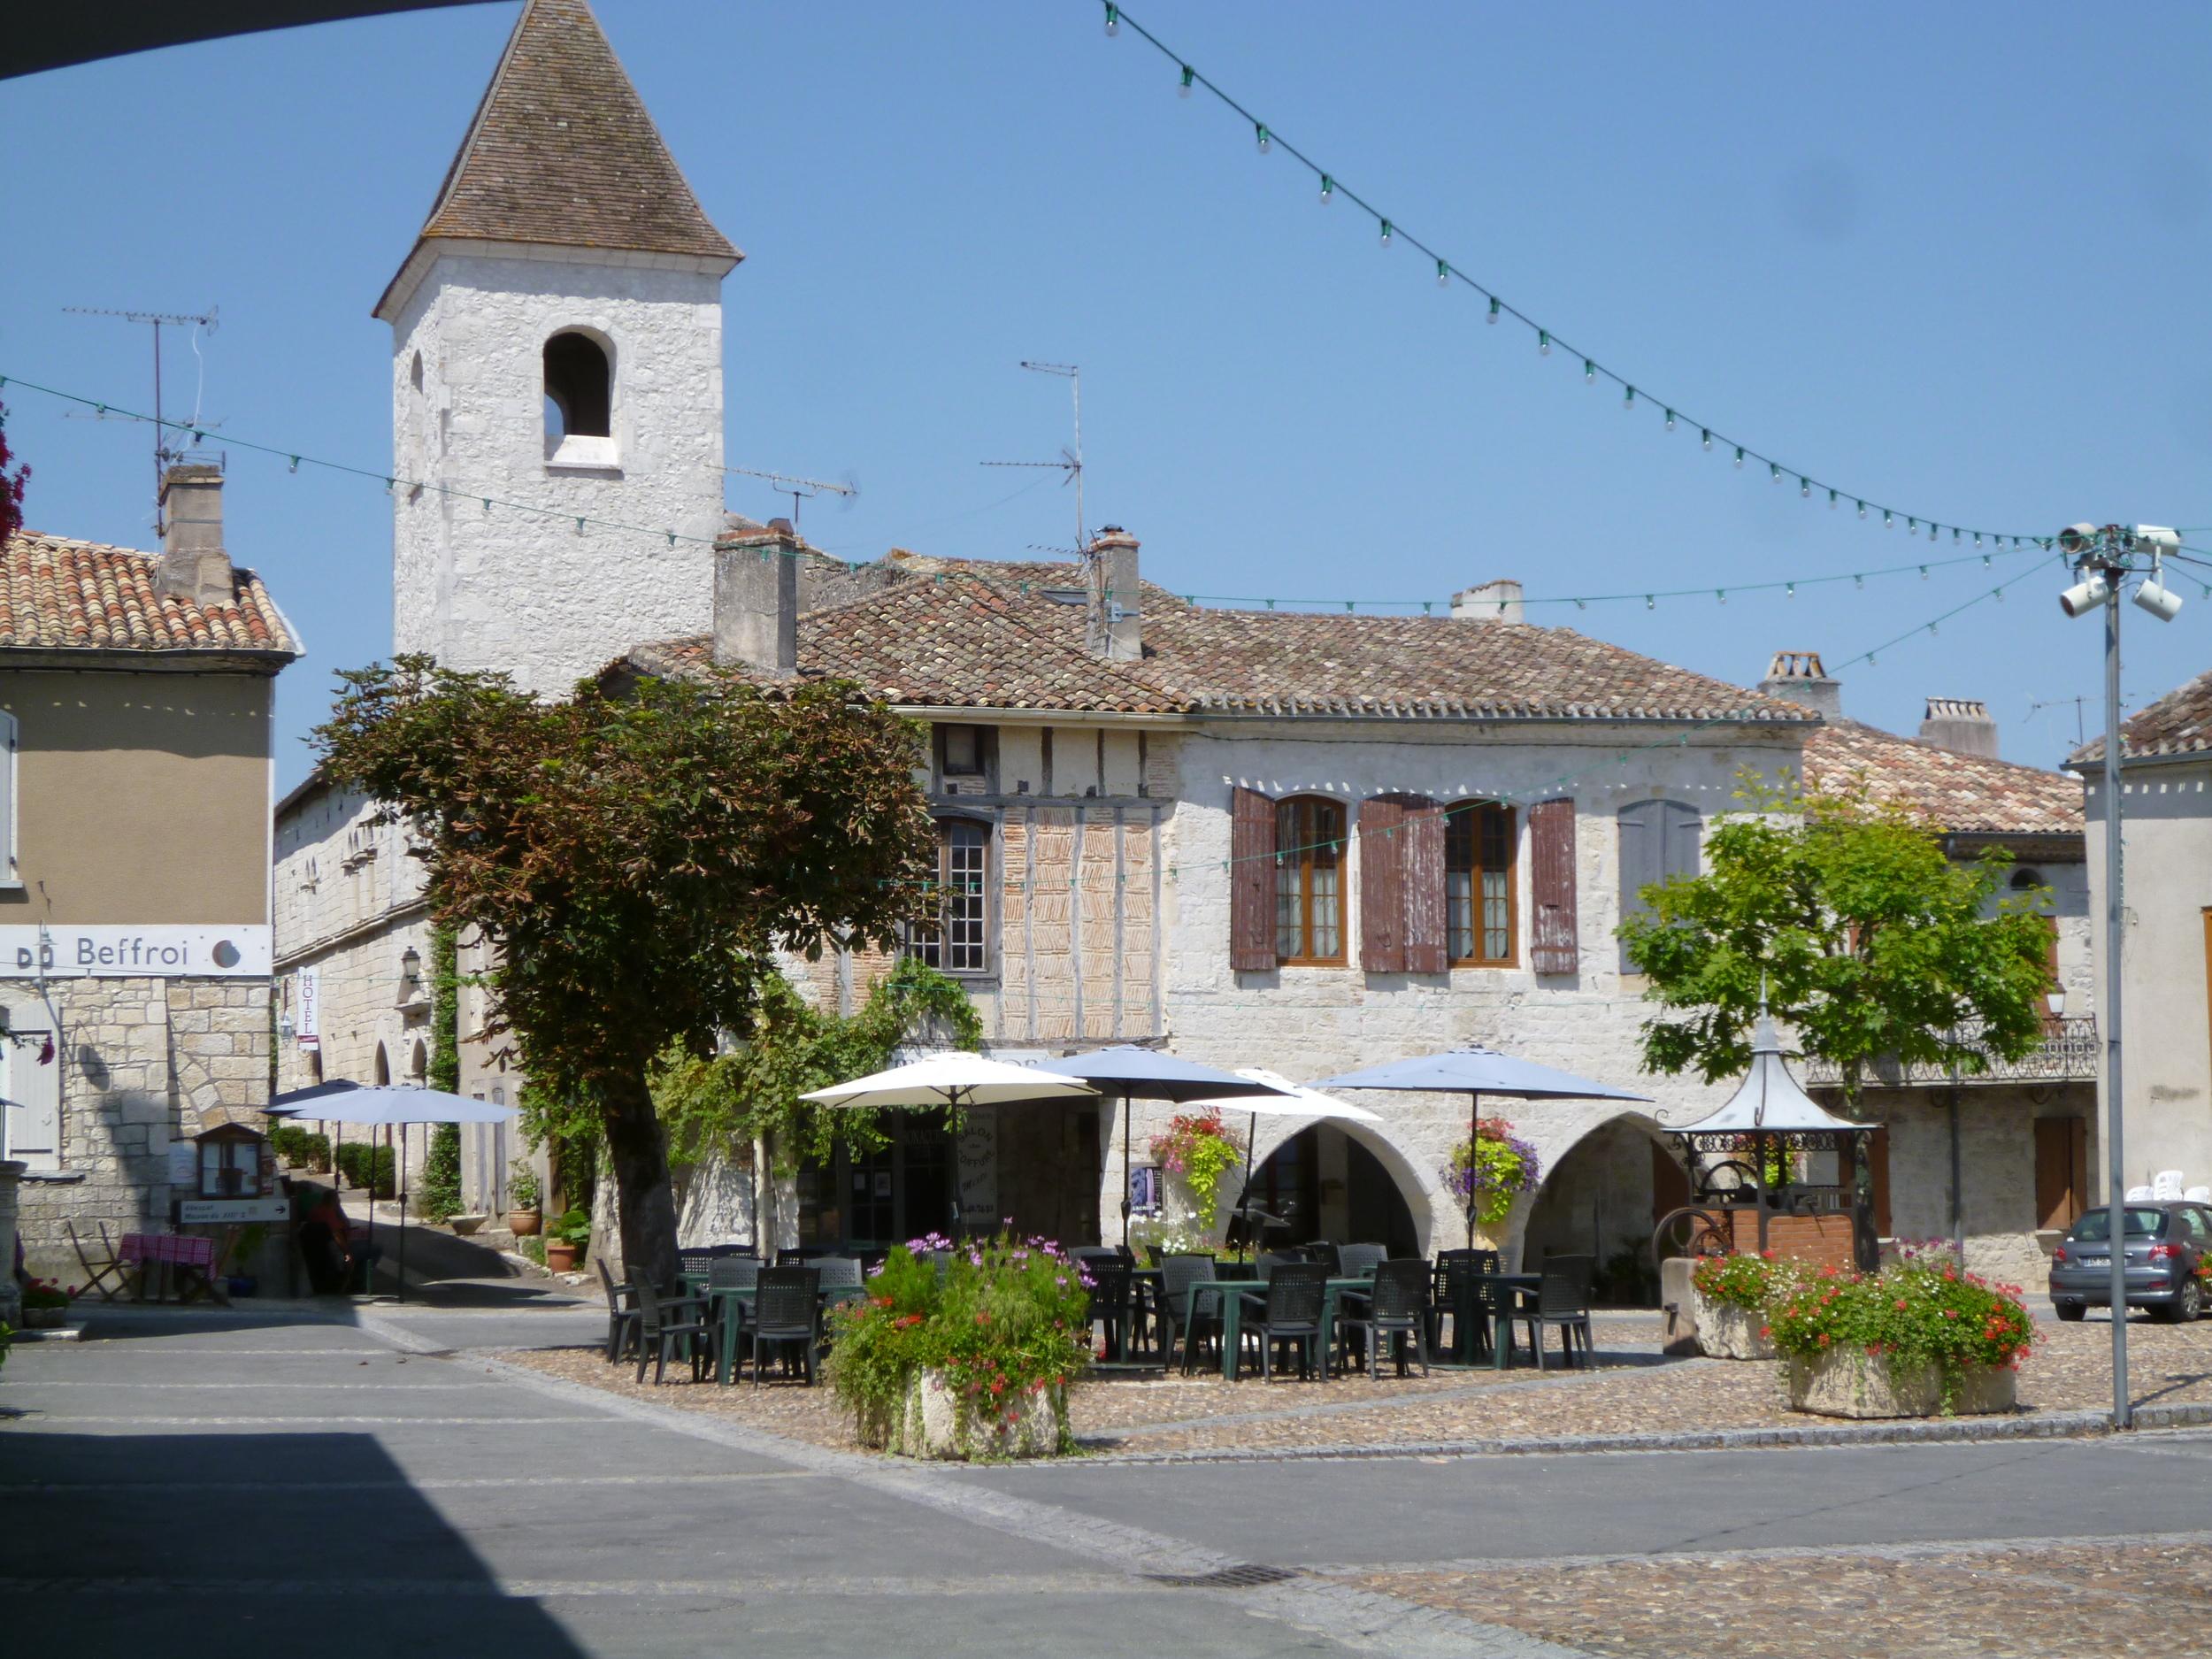 The village square, Tournon d'Agenais.